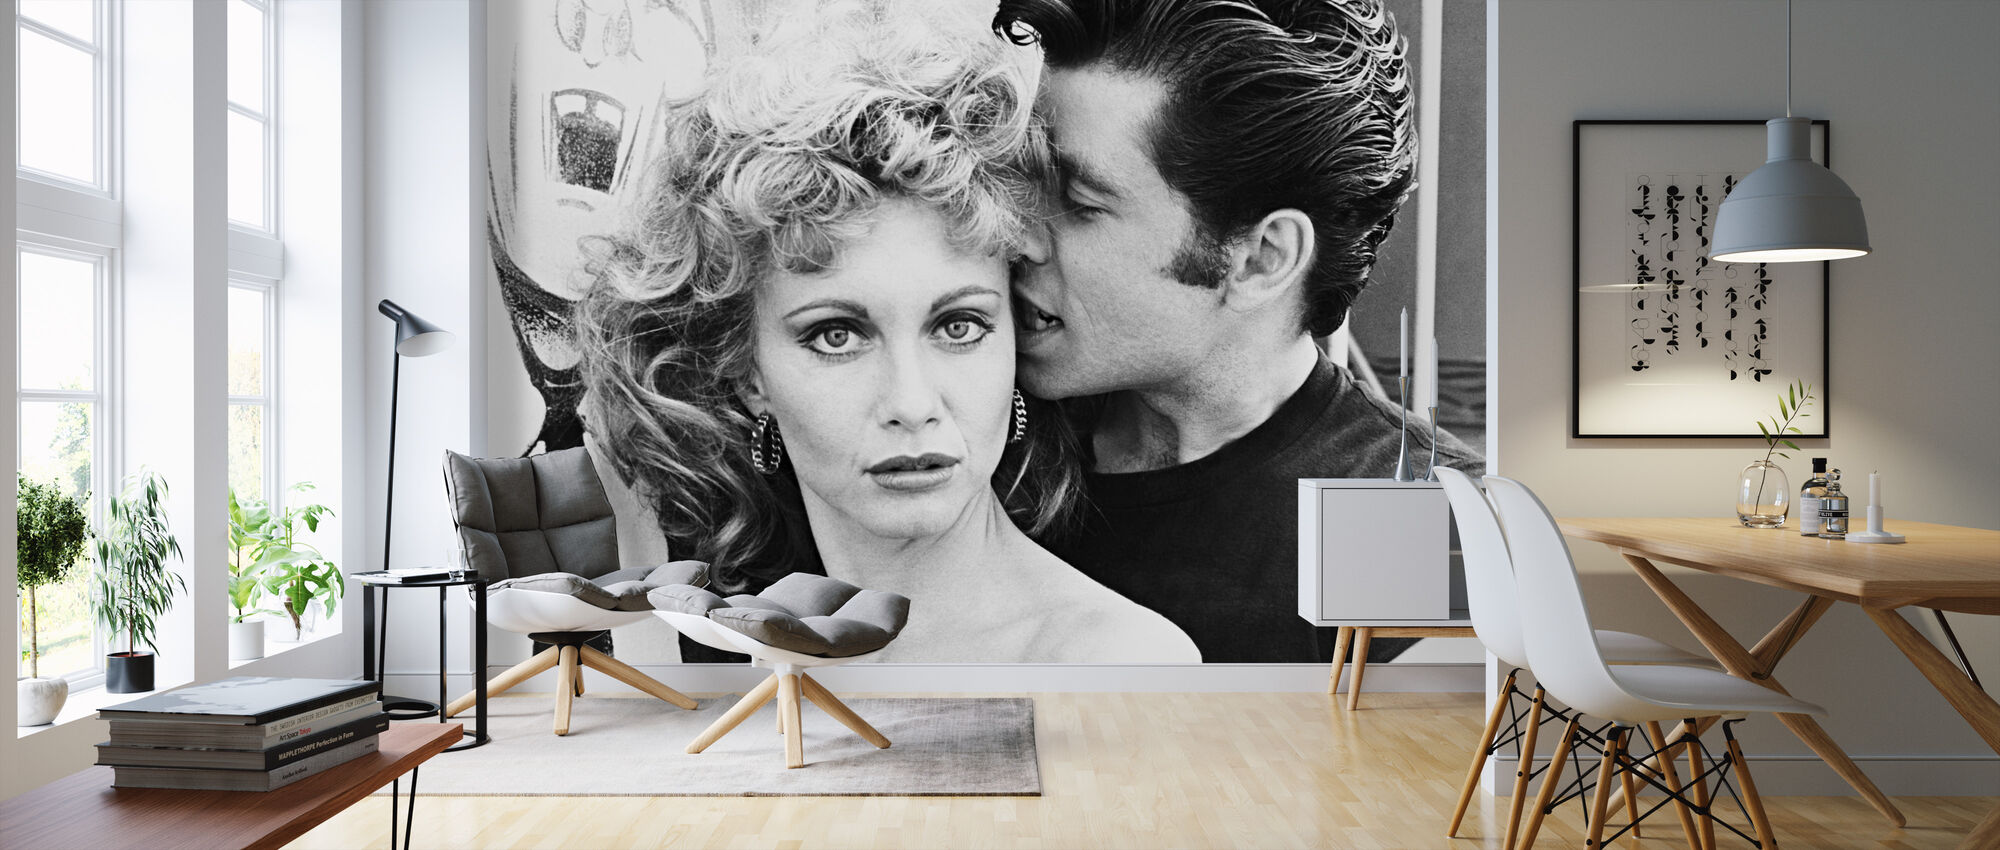 Grease John Travolta And Olivia Newton John Decorate